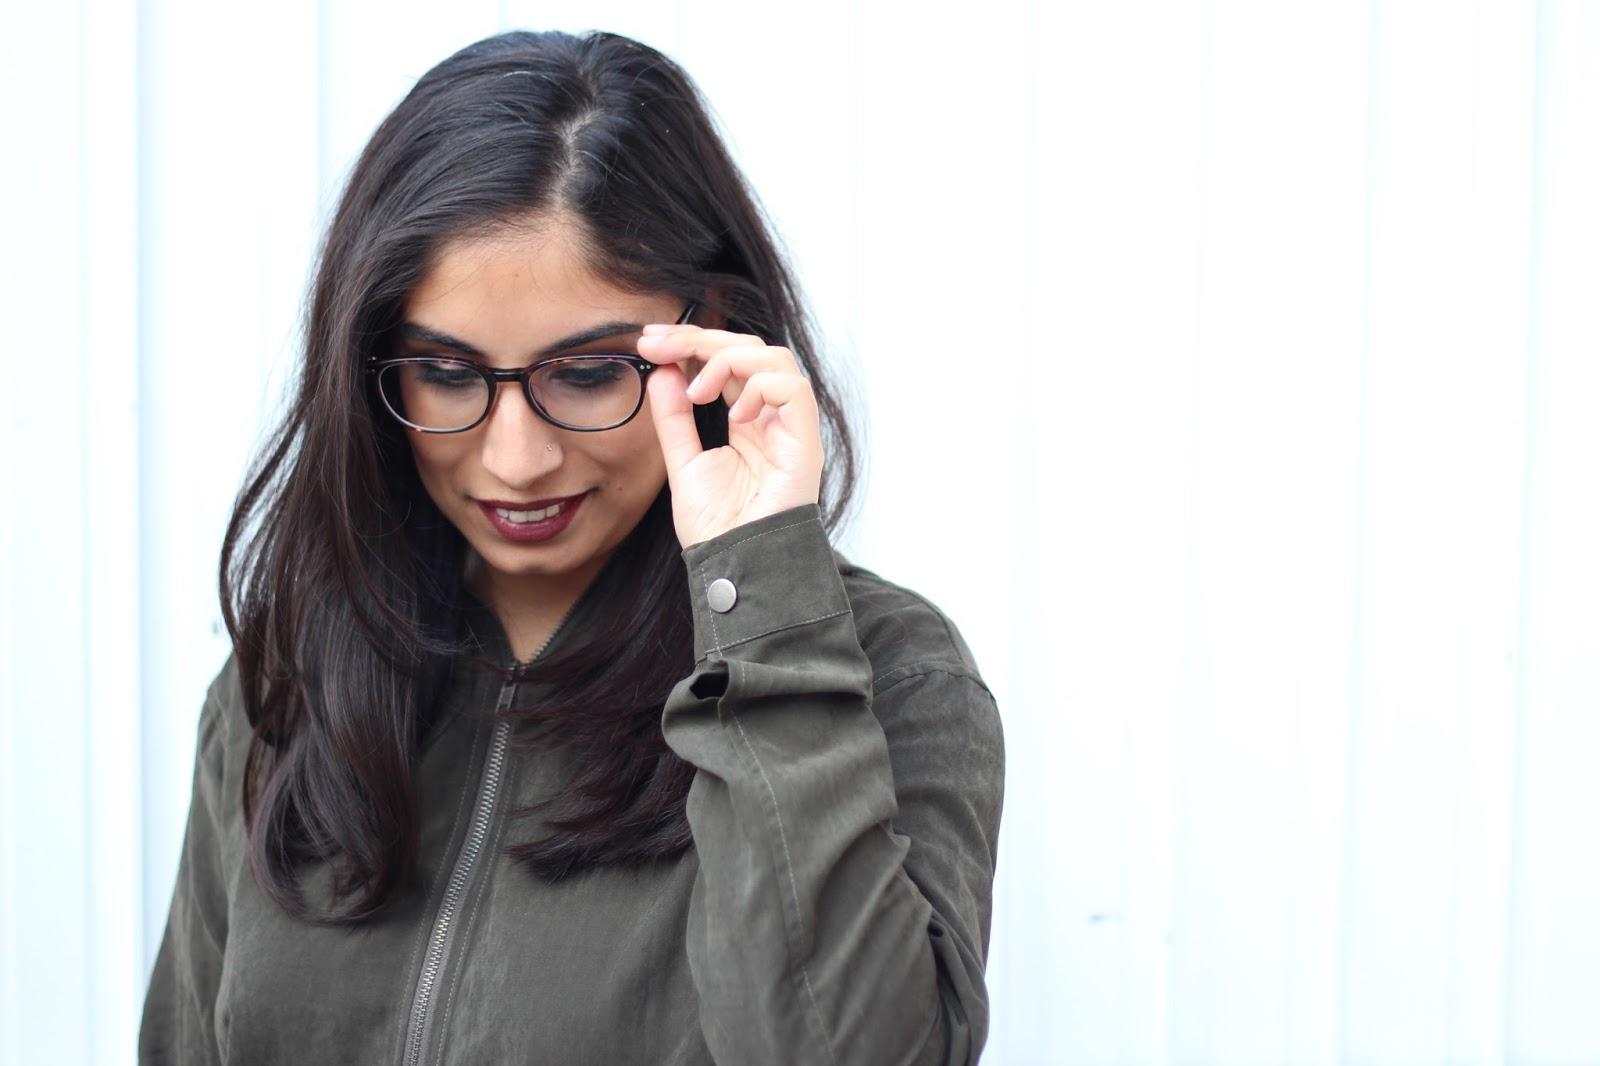 c8b17aa27f Firmoo Glasses Review